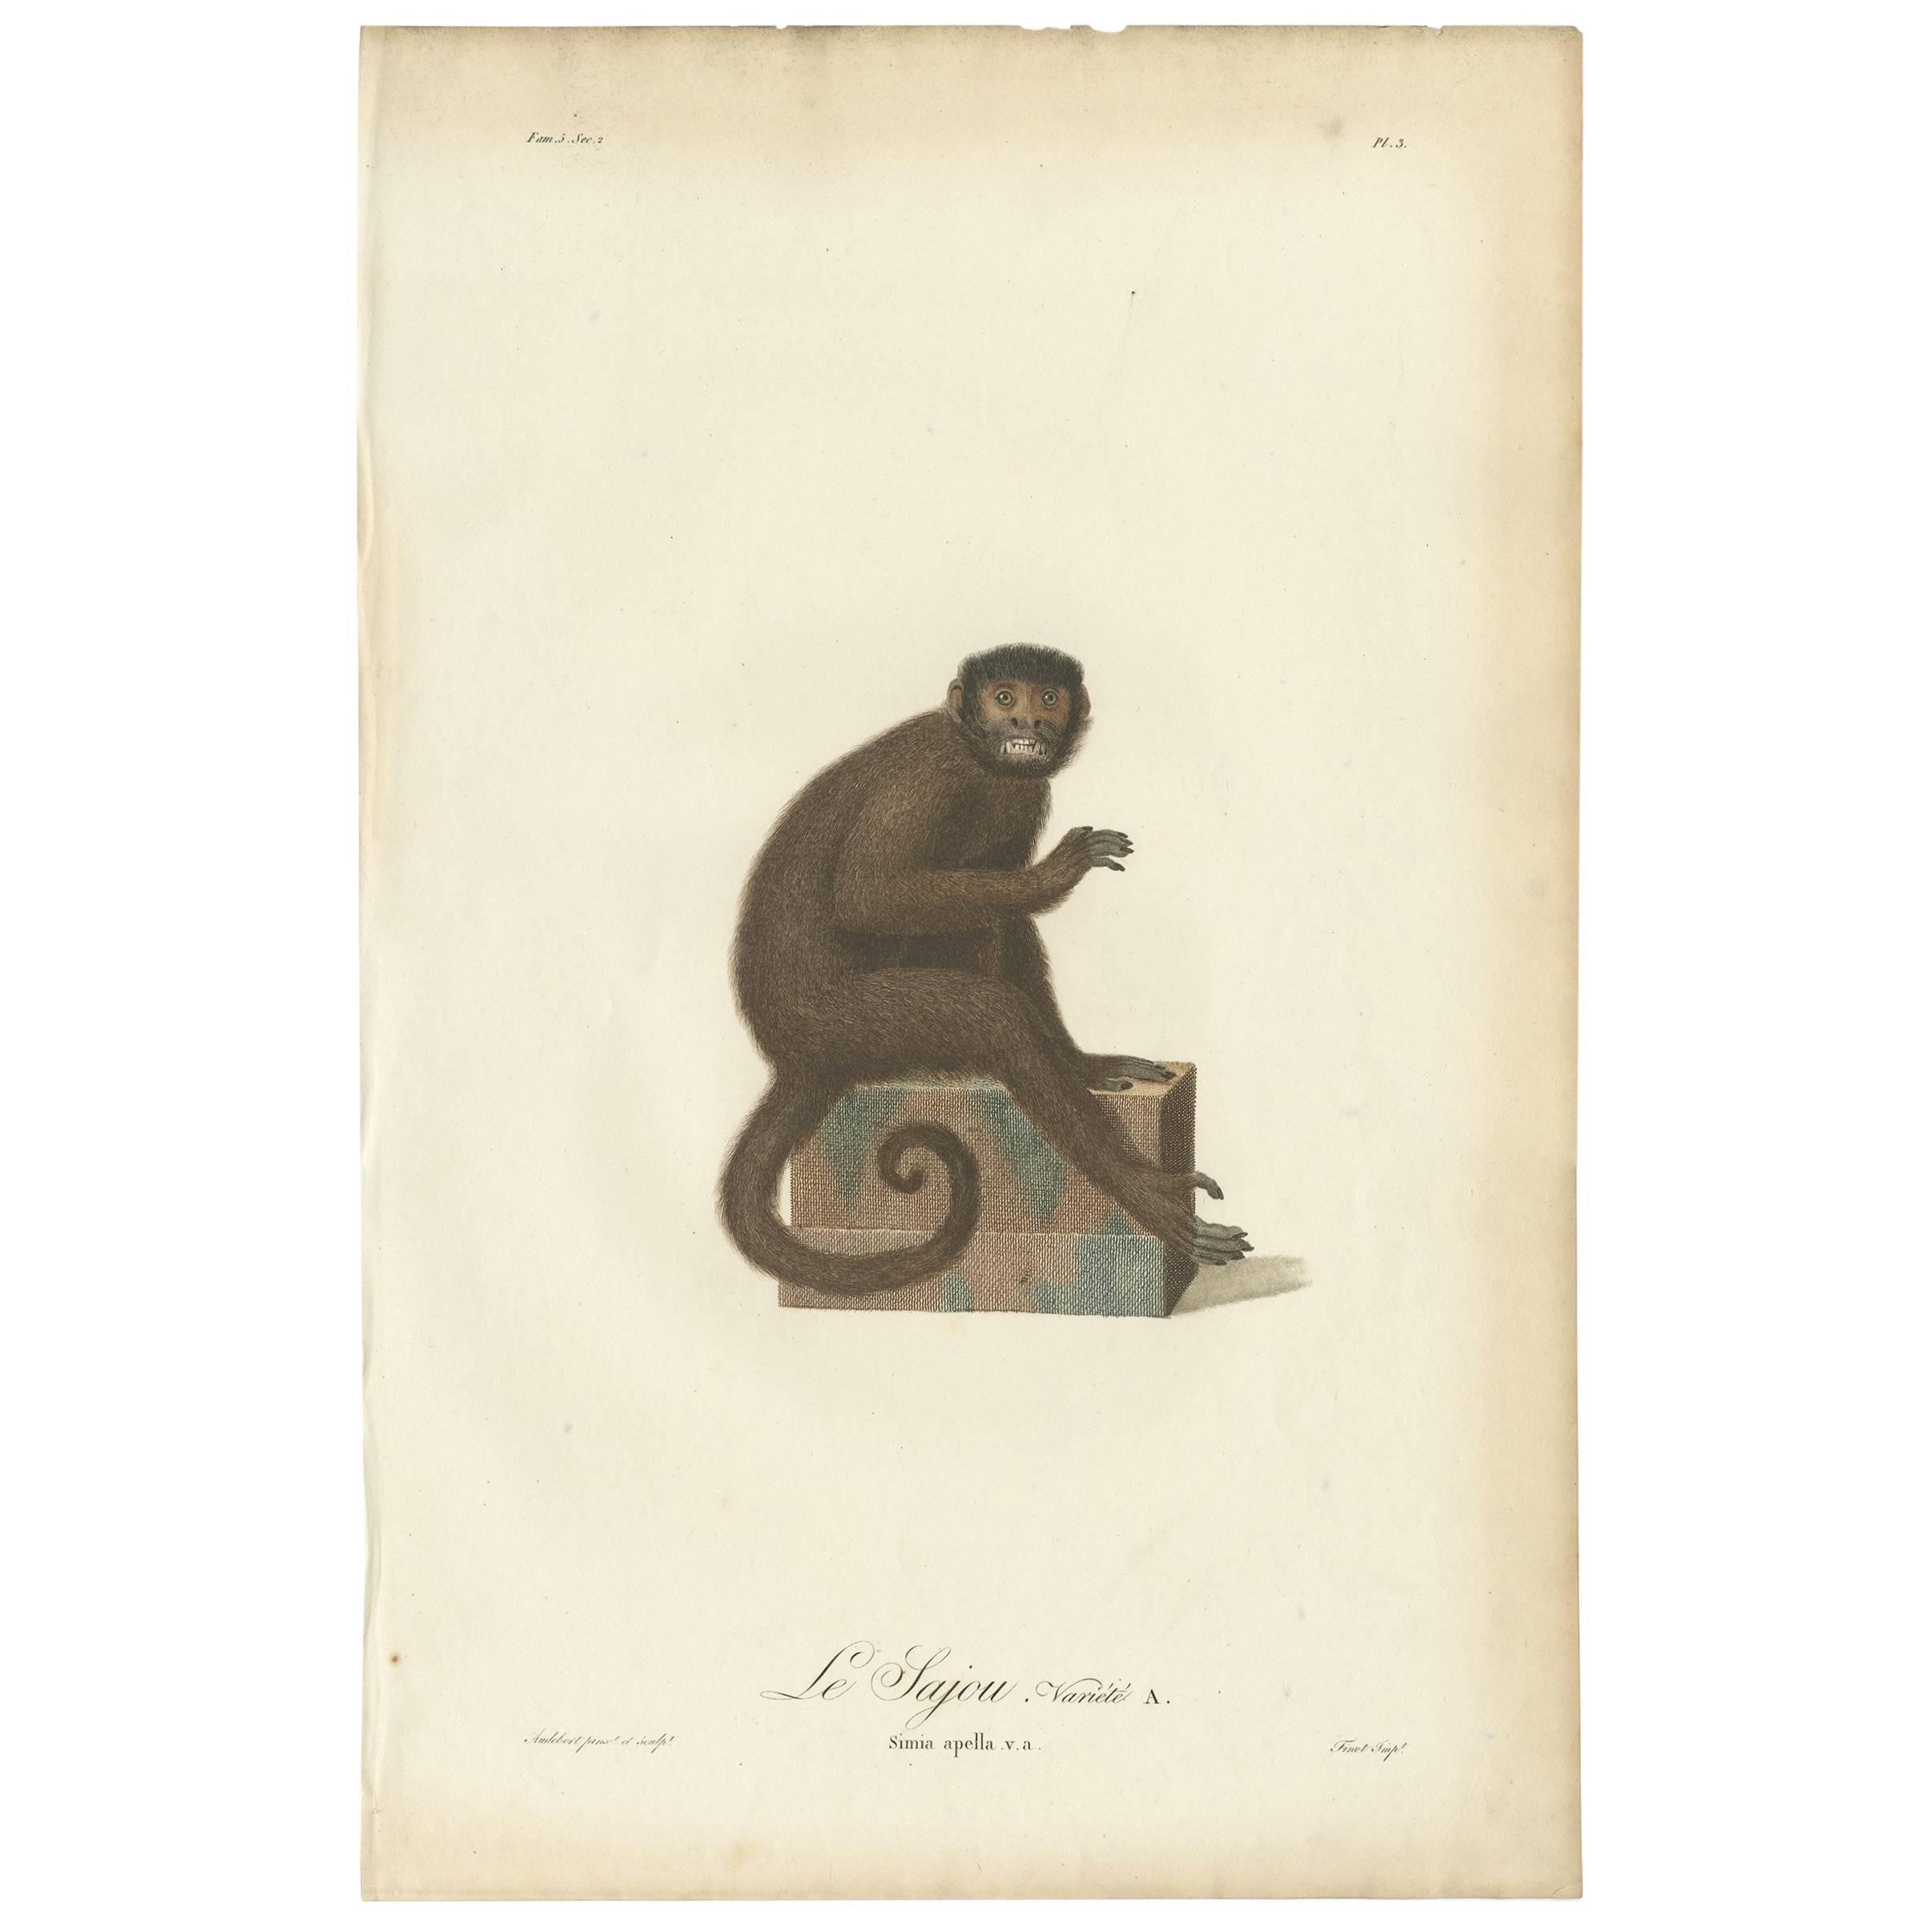 Antique Print of a Monkey by J.B. Audebert, circa 1798